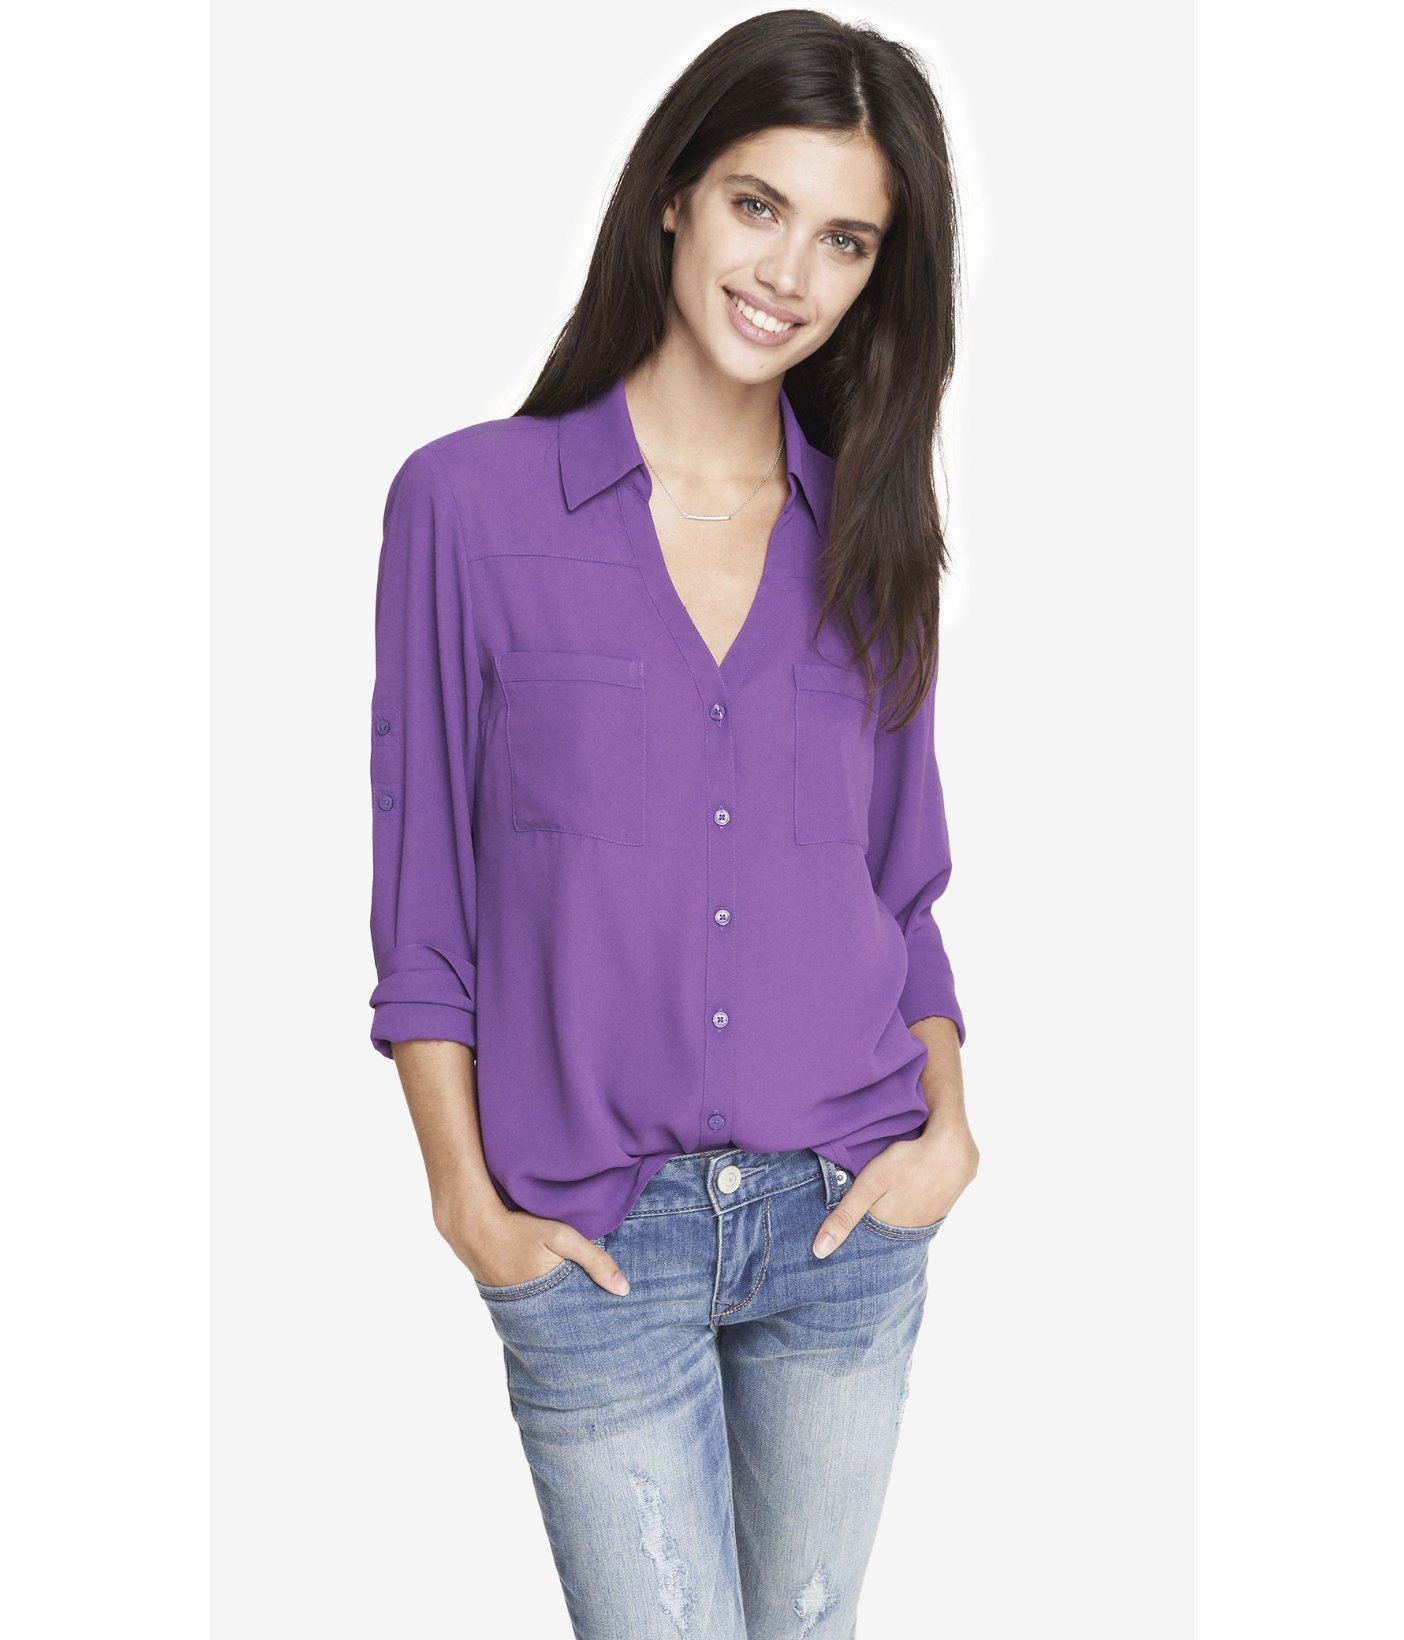 3889a283a75b0 Lyst - Express The Convertible Sleeve Portofino Shirt in Purple